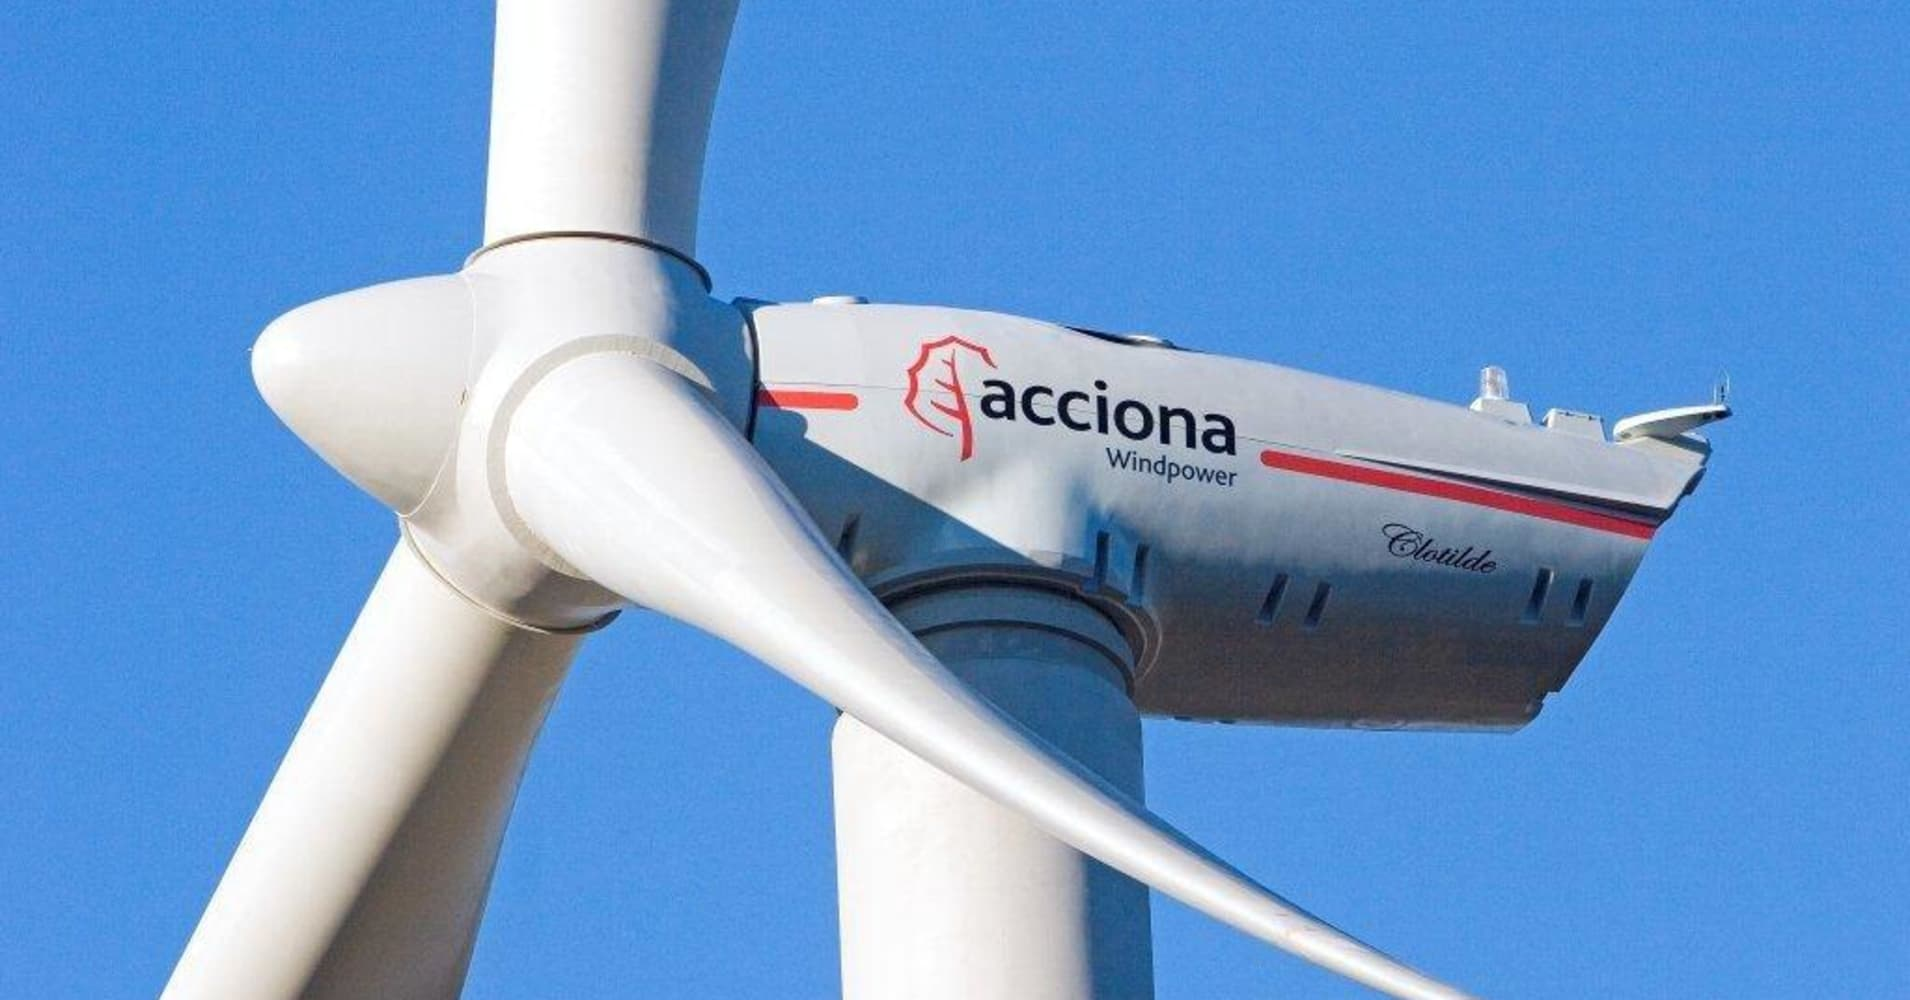 Spanish company starts construction work on Texan wind farm